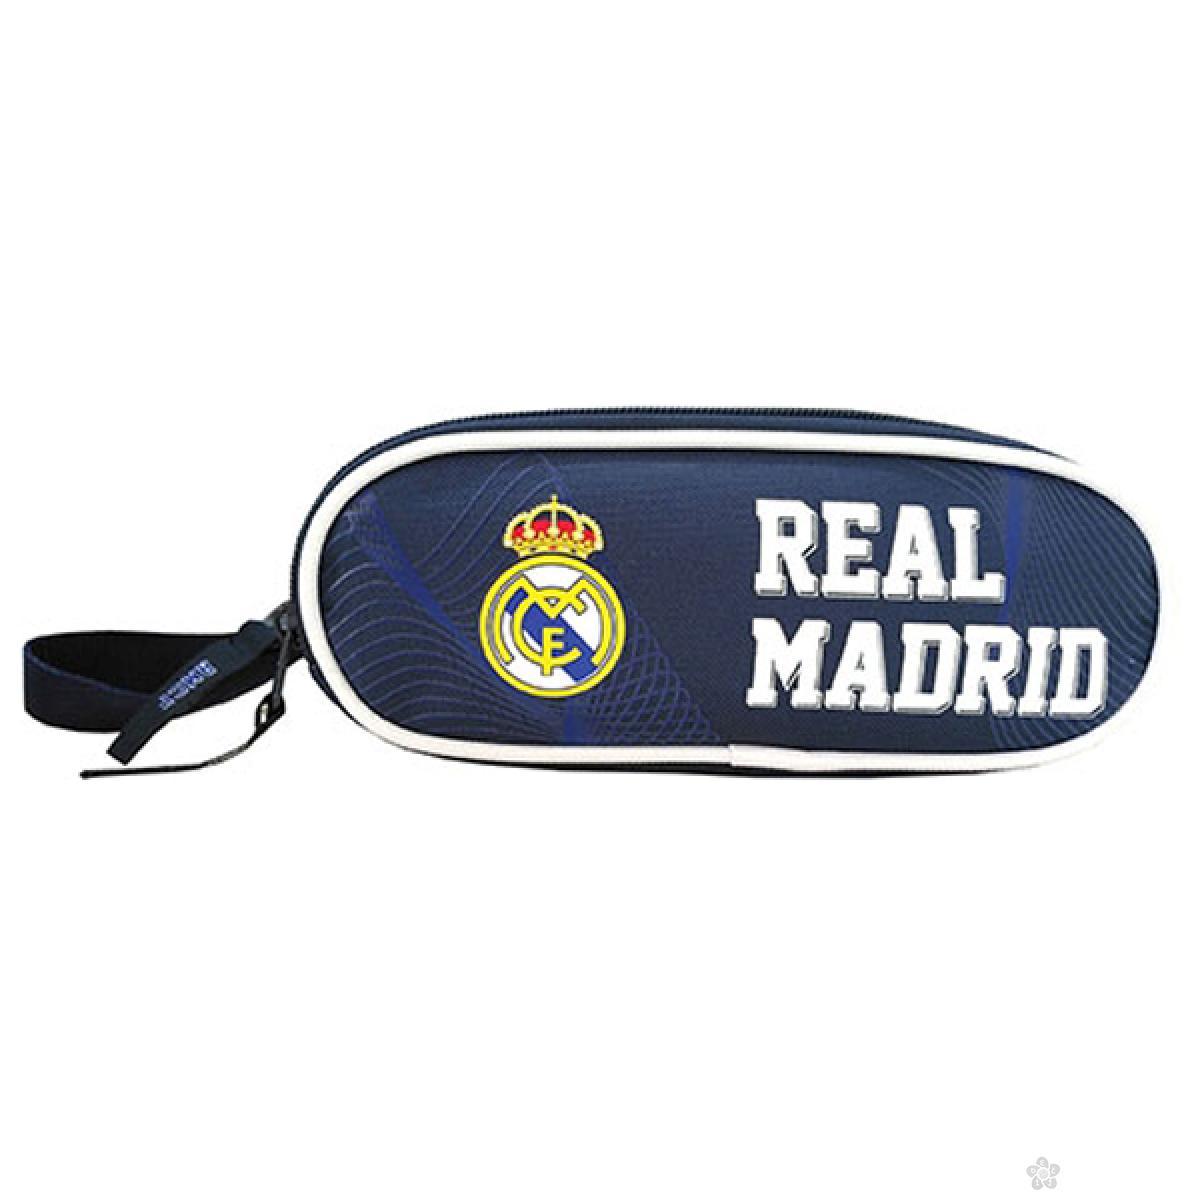 Ovalna pernica Real Madrid 53571